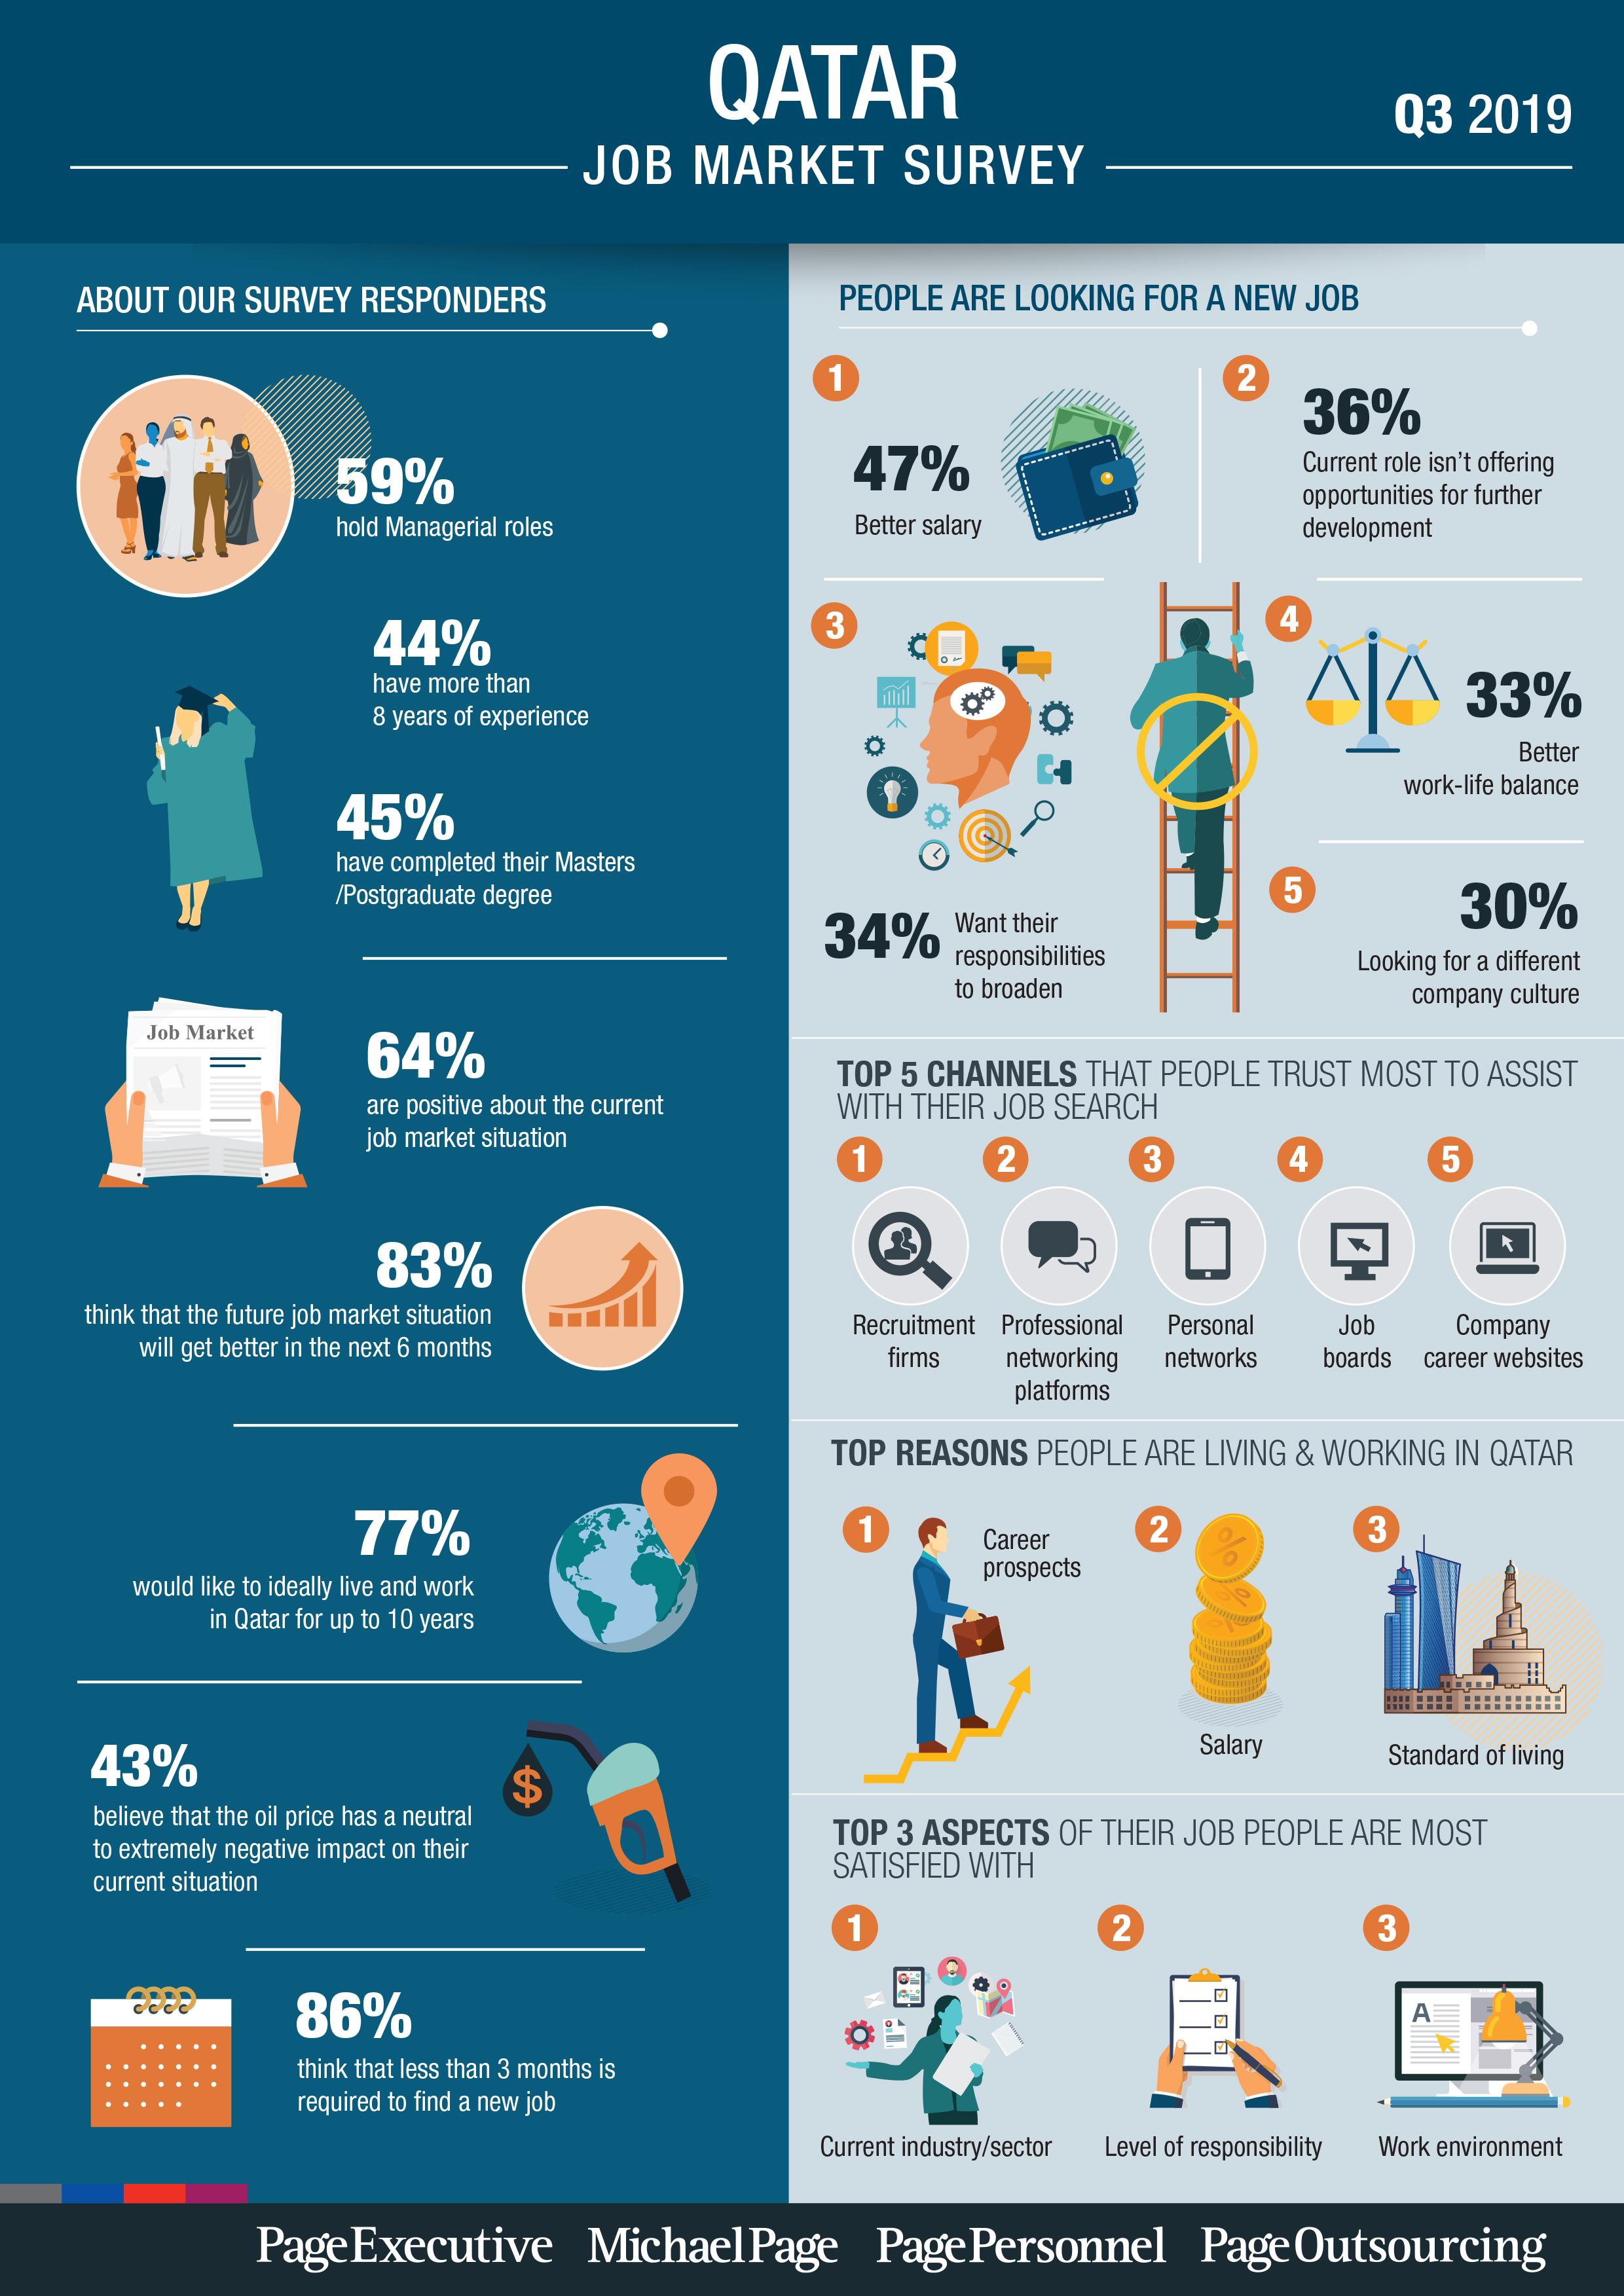 Q3 2019 Job Market Survey - Qatar